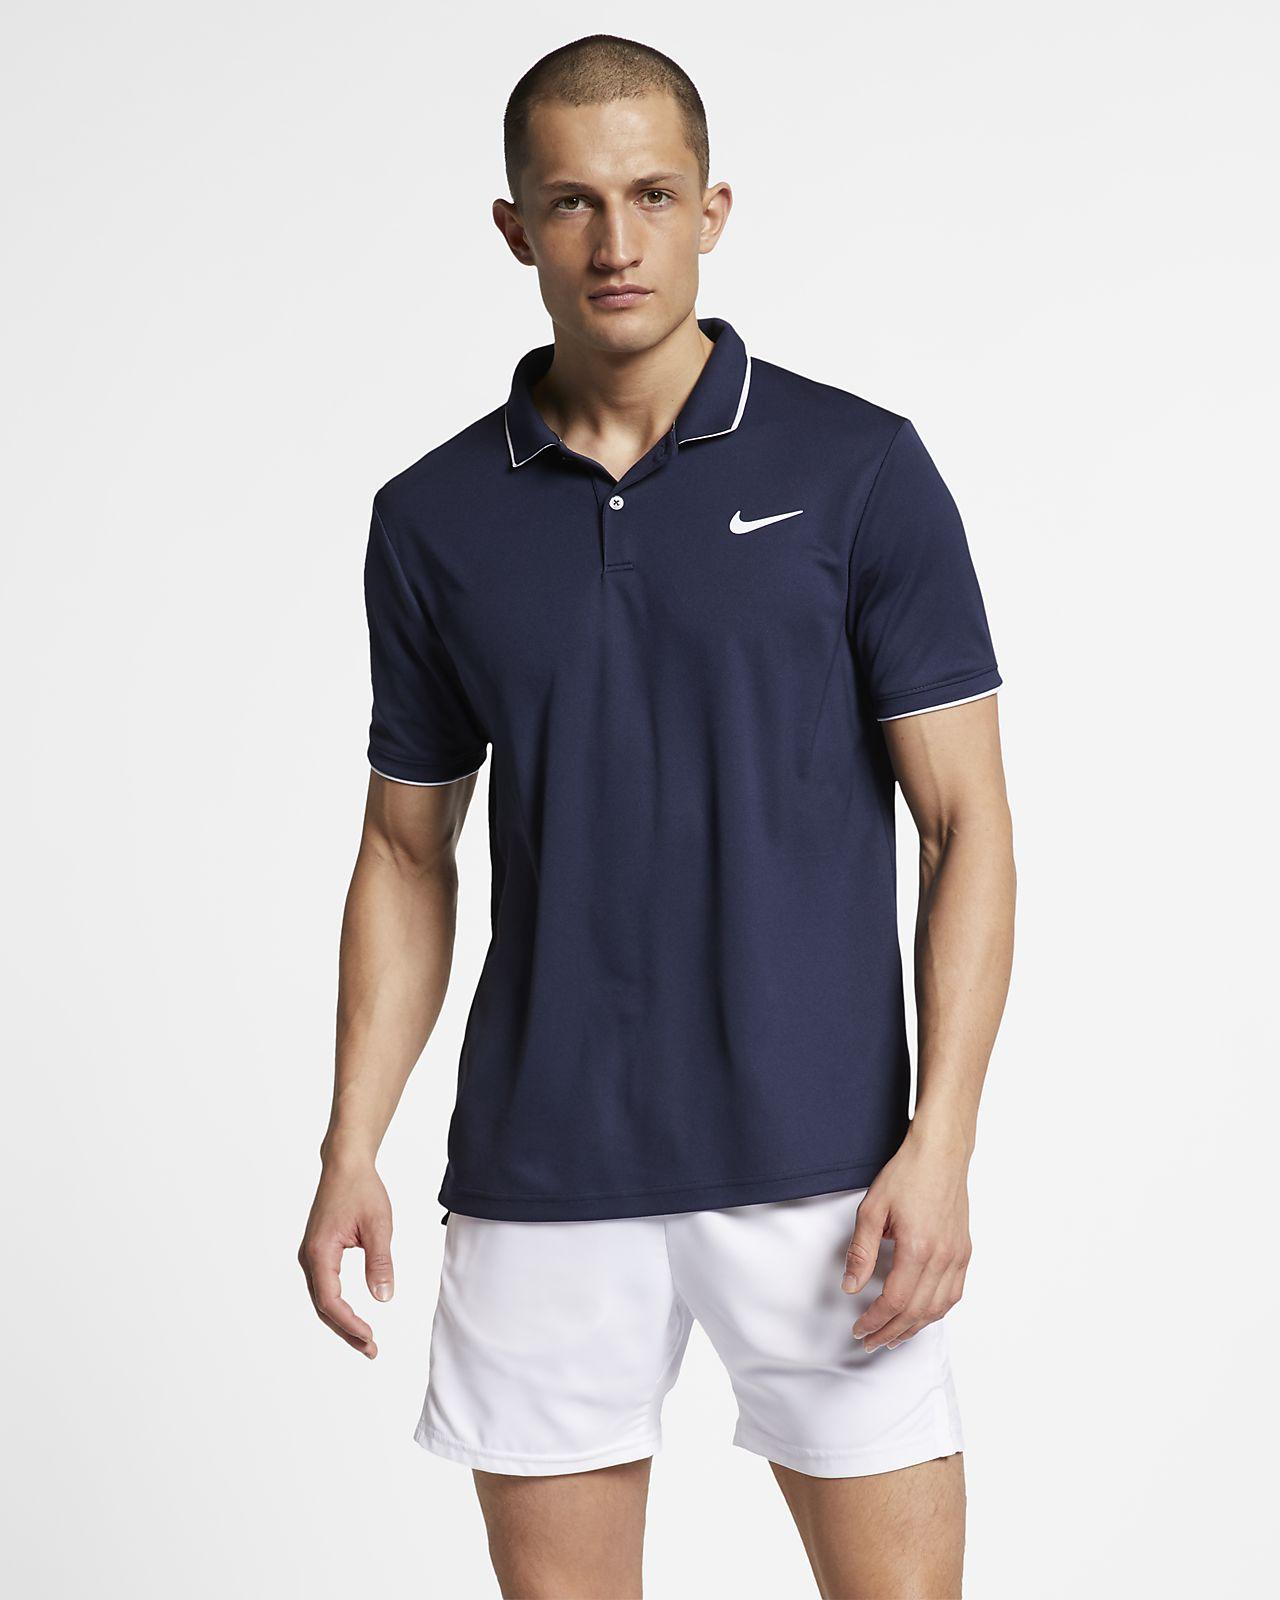 f41f92e2 NikeCourt Dri-FIT Team Men's Tennis Polo. Nike.com